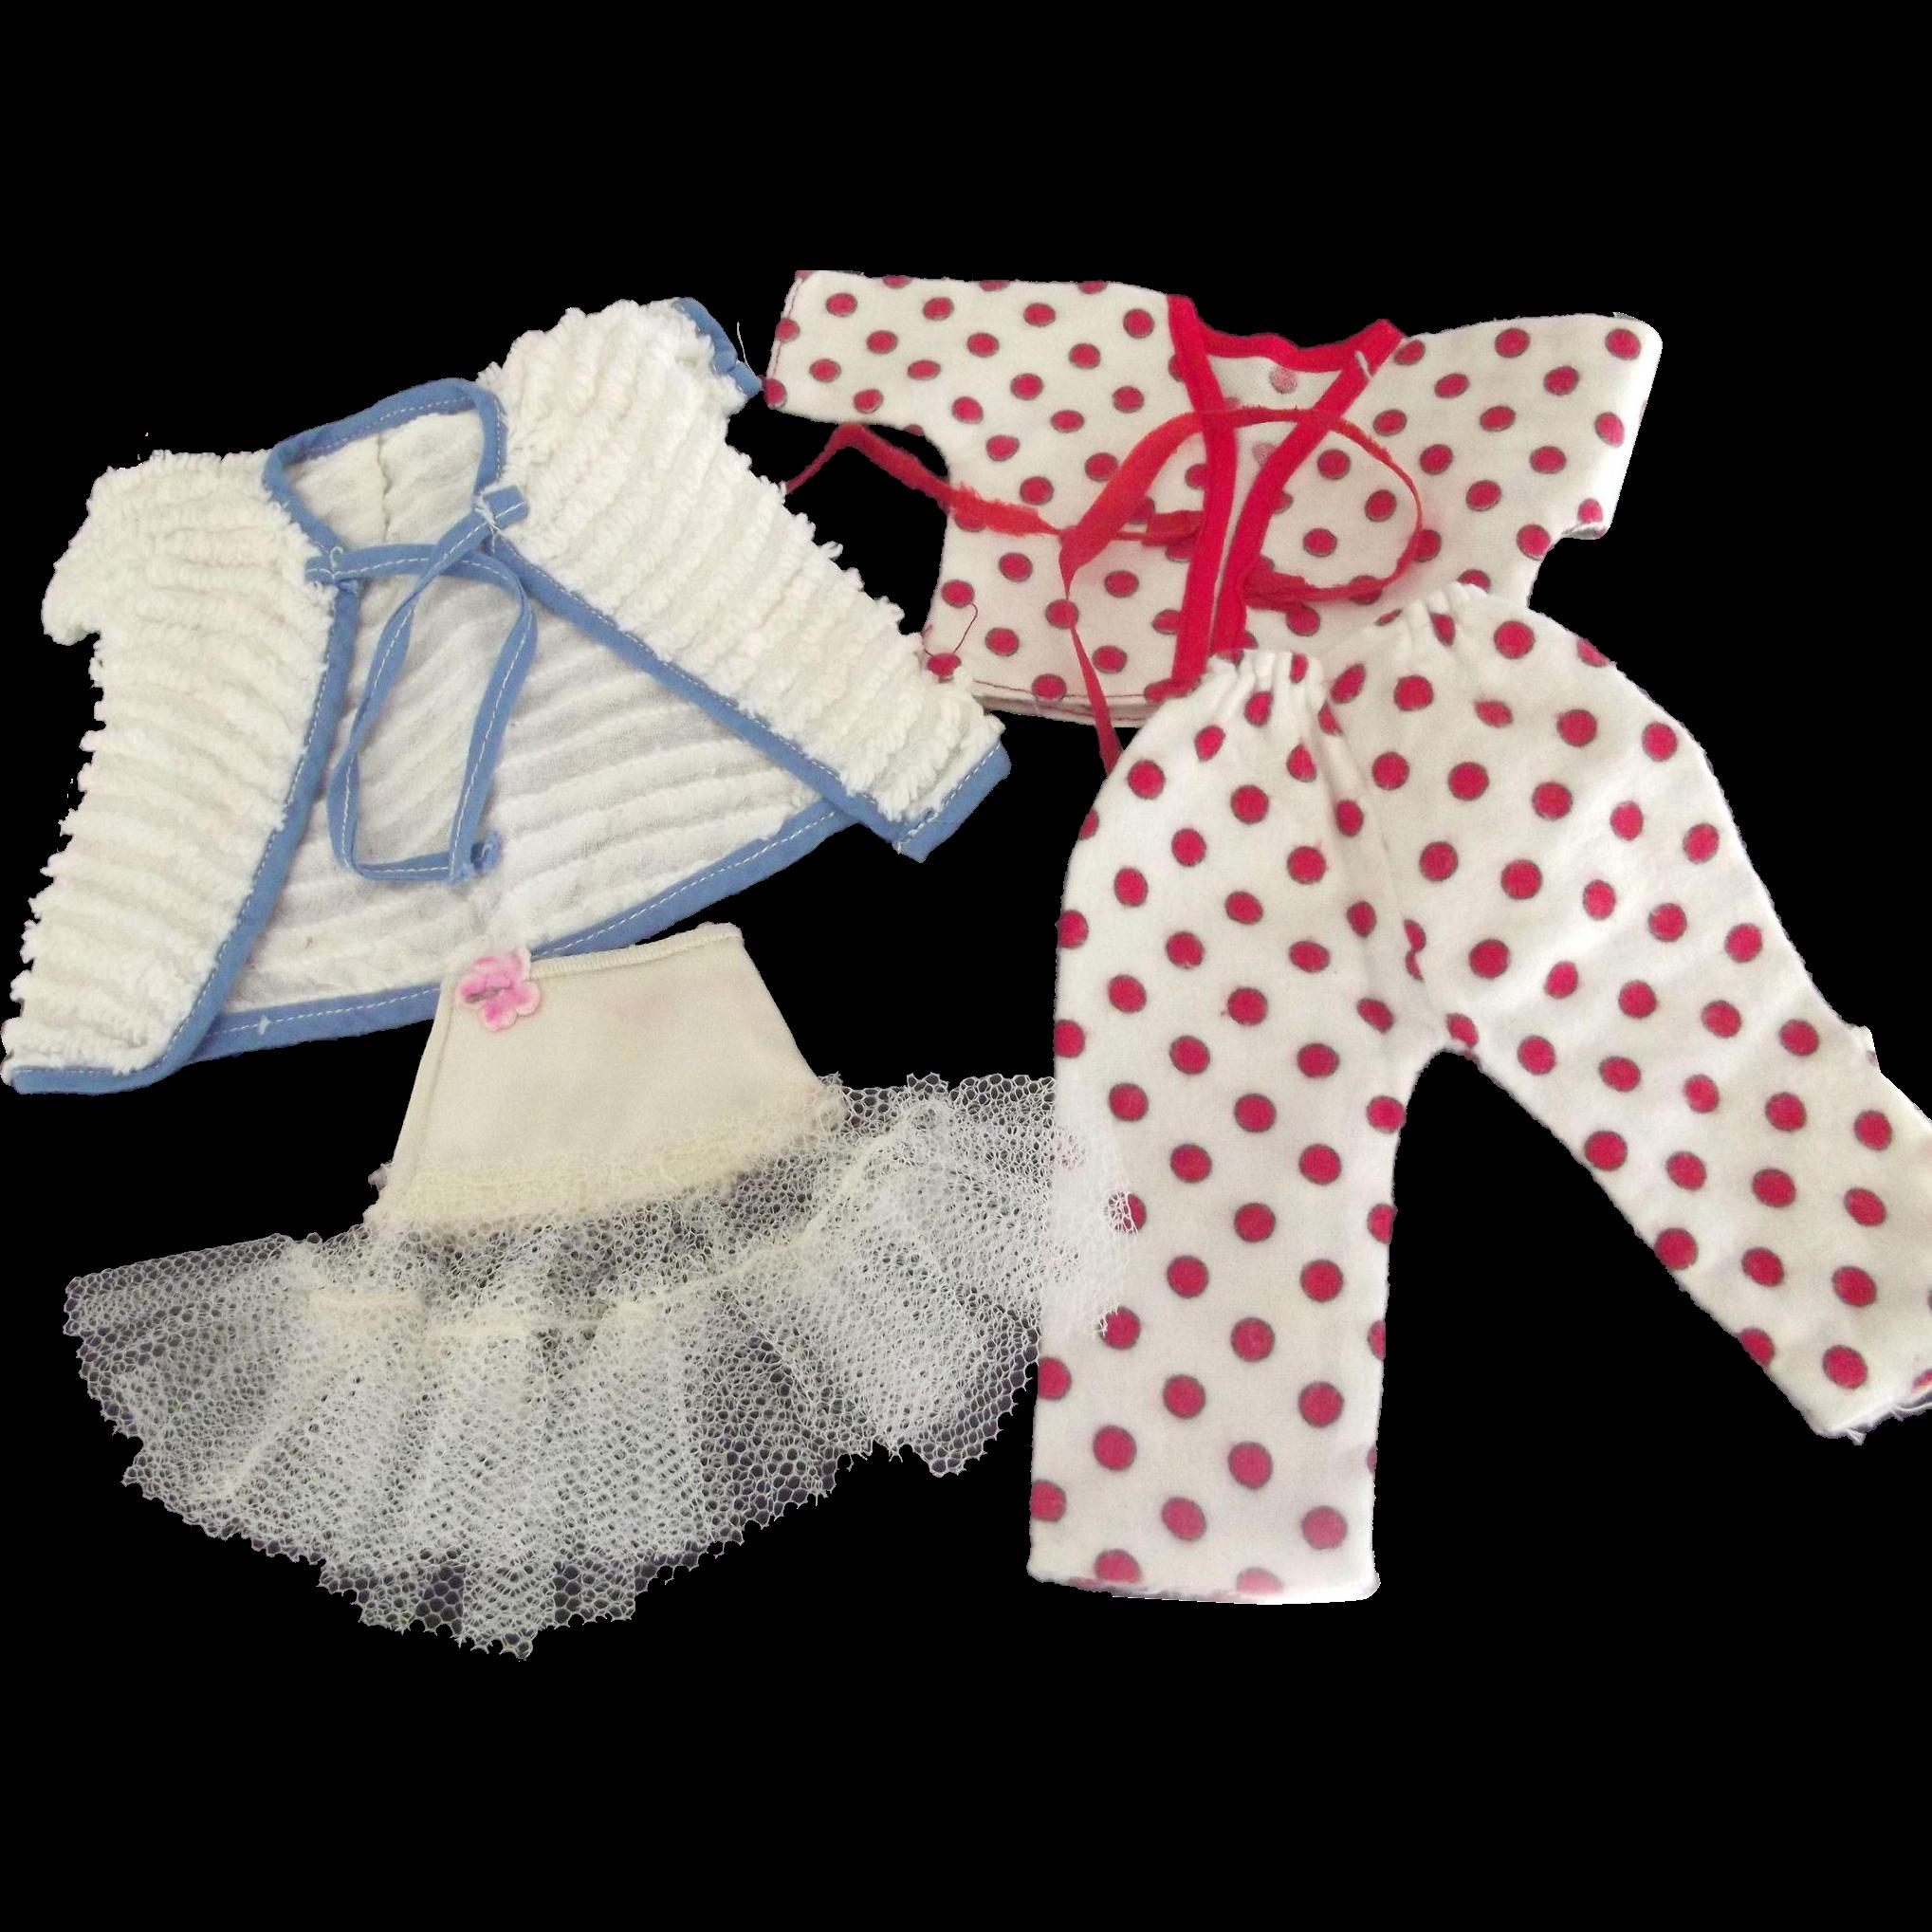 Doll Pajamas, Robe and Girdle